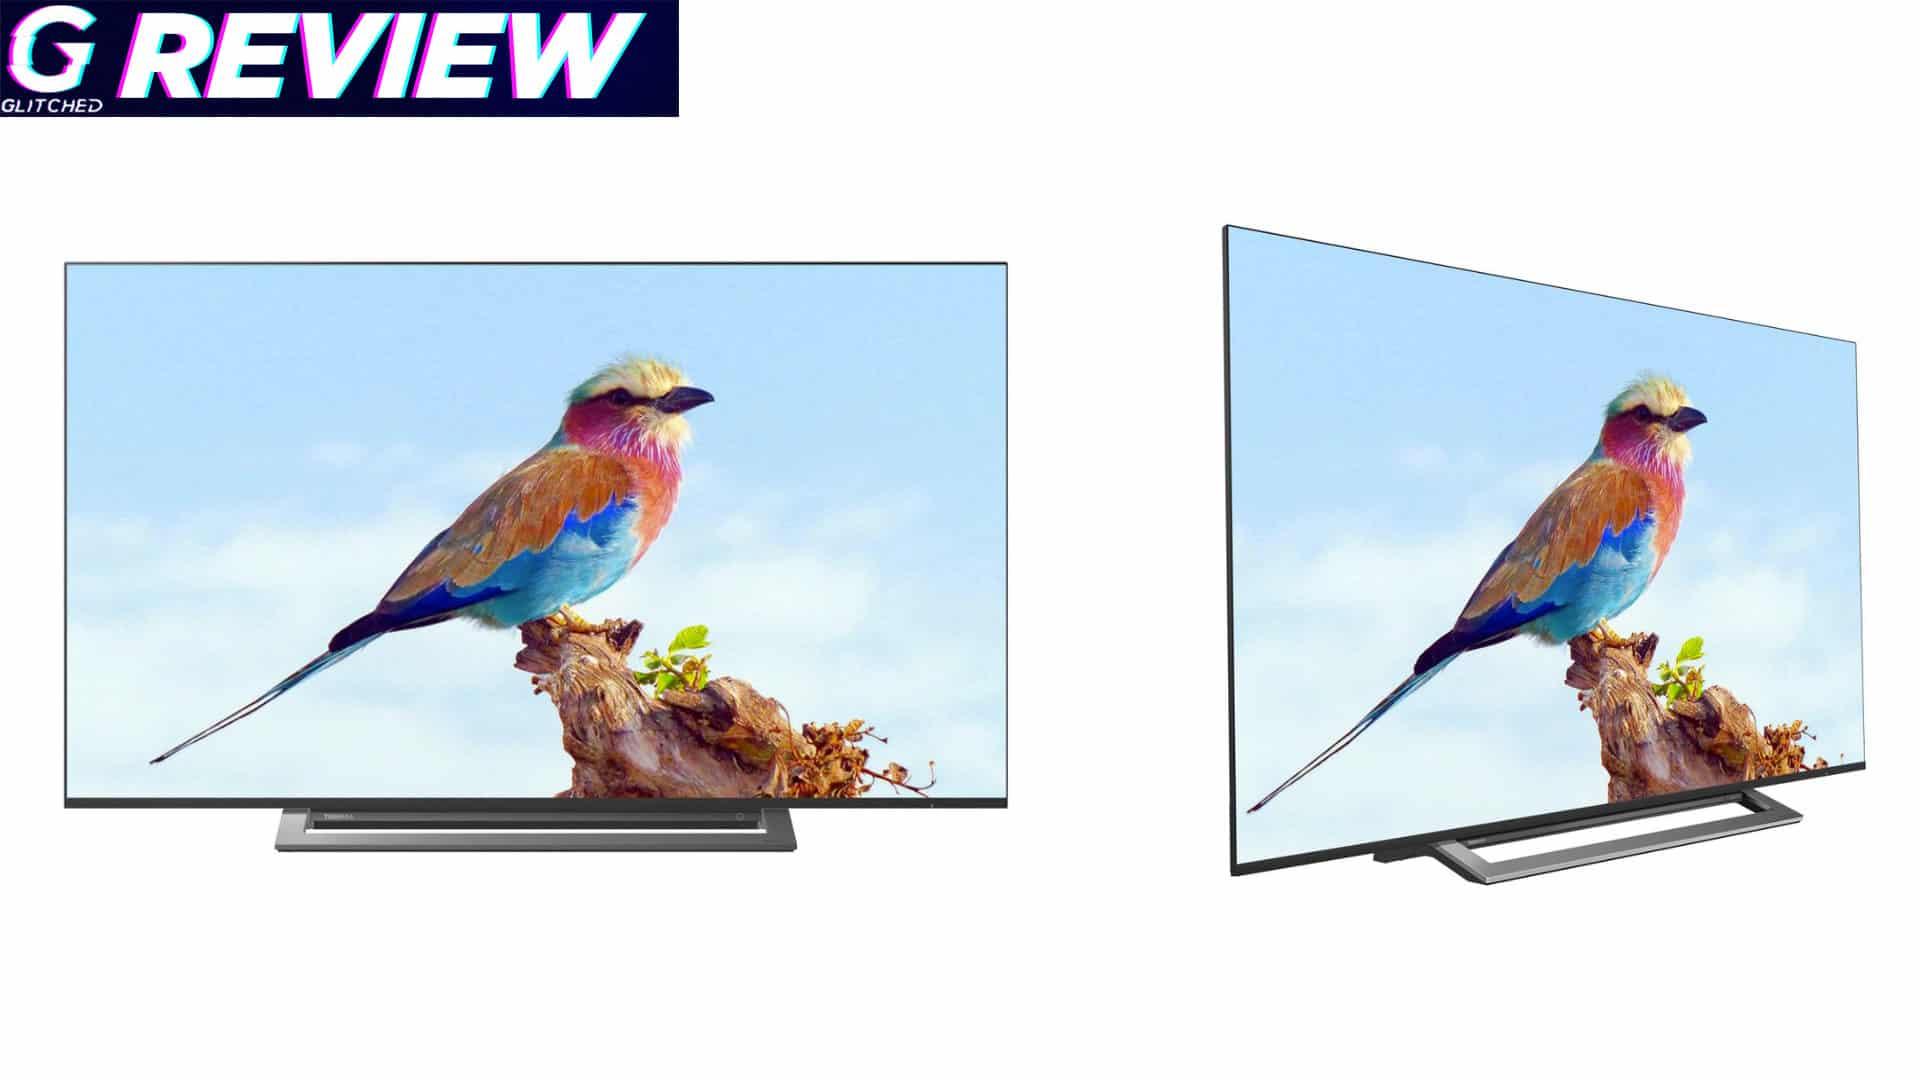 Toshiba 55U79 4K HDR TV Review